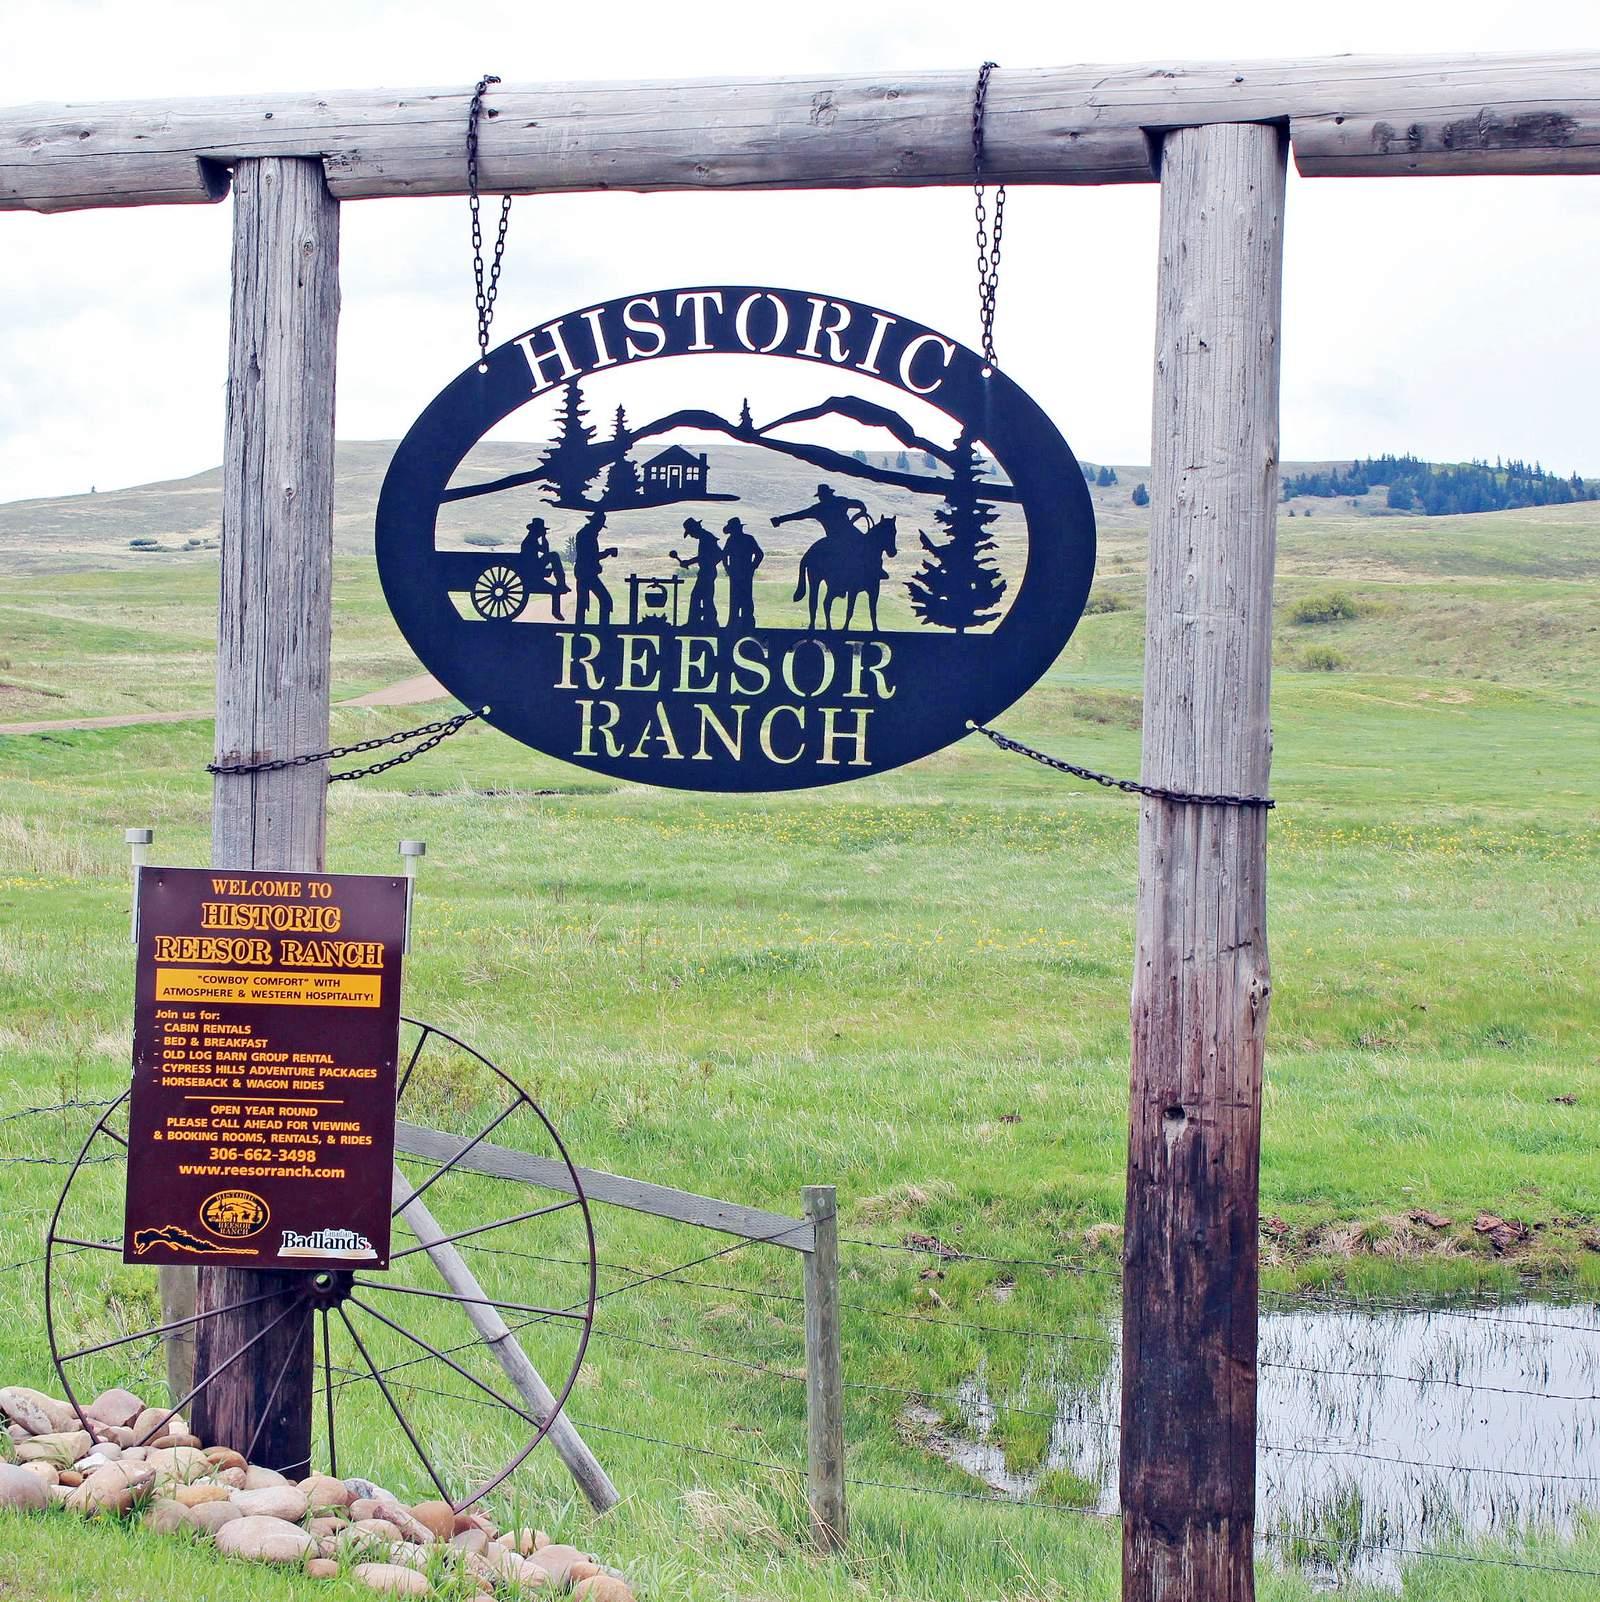 Willkommen in der Historic Reesor Ranch